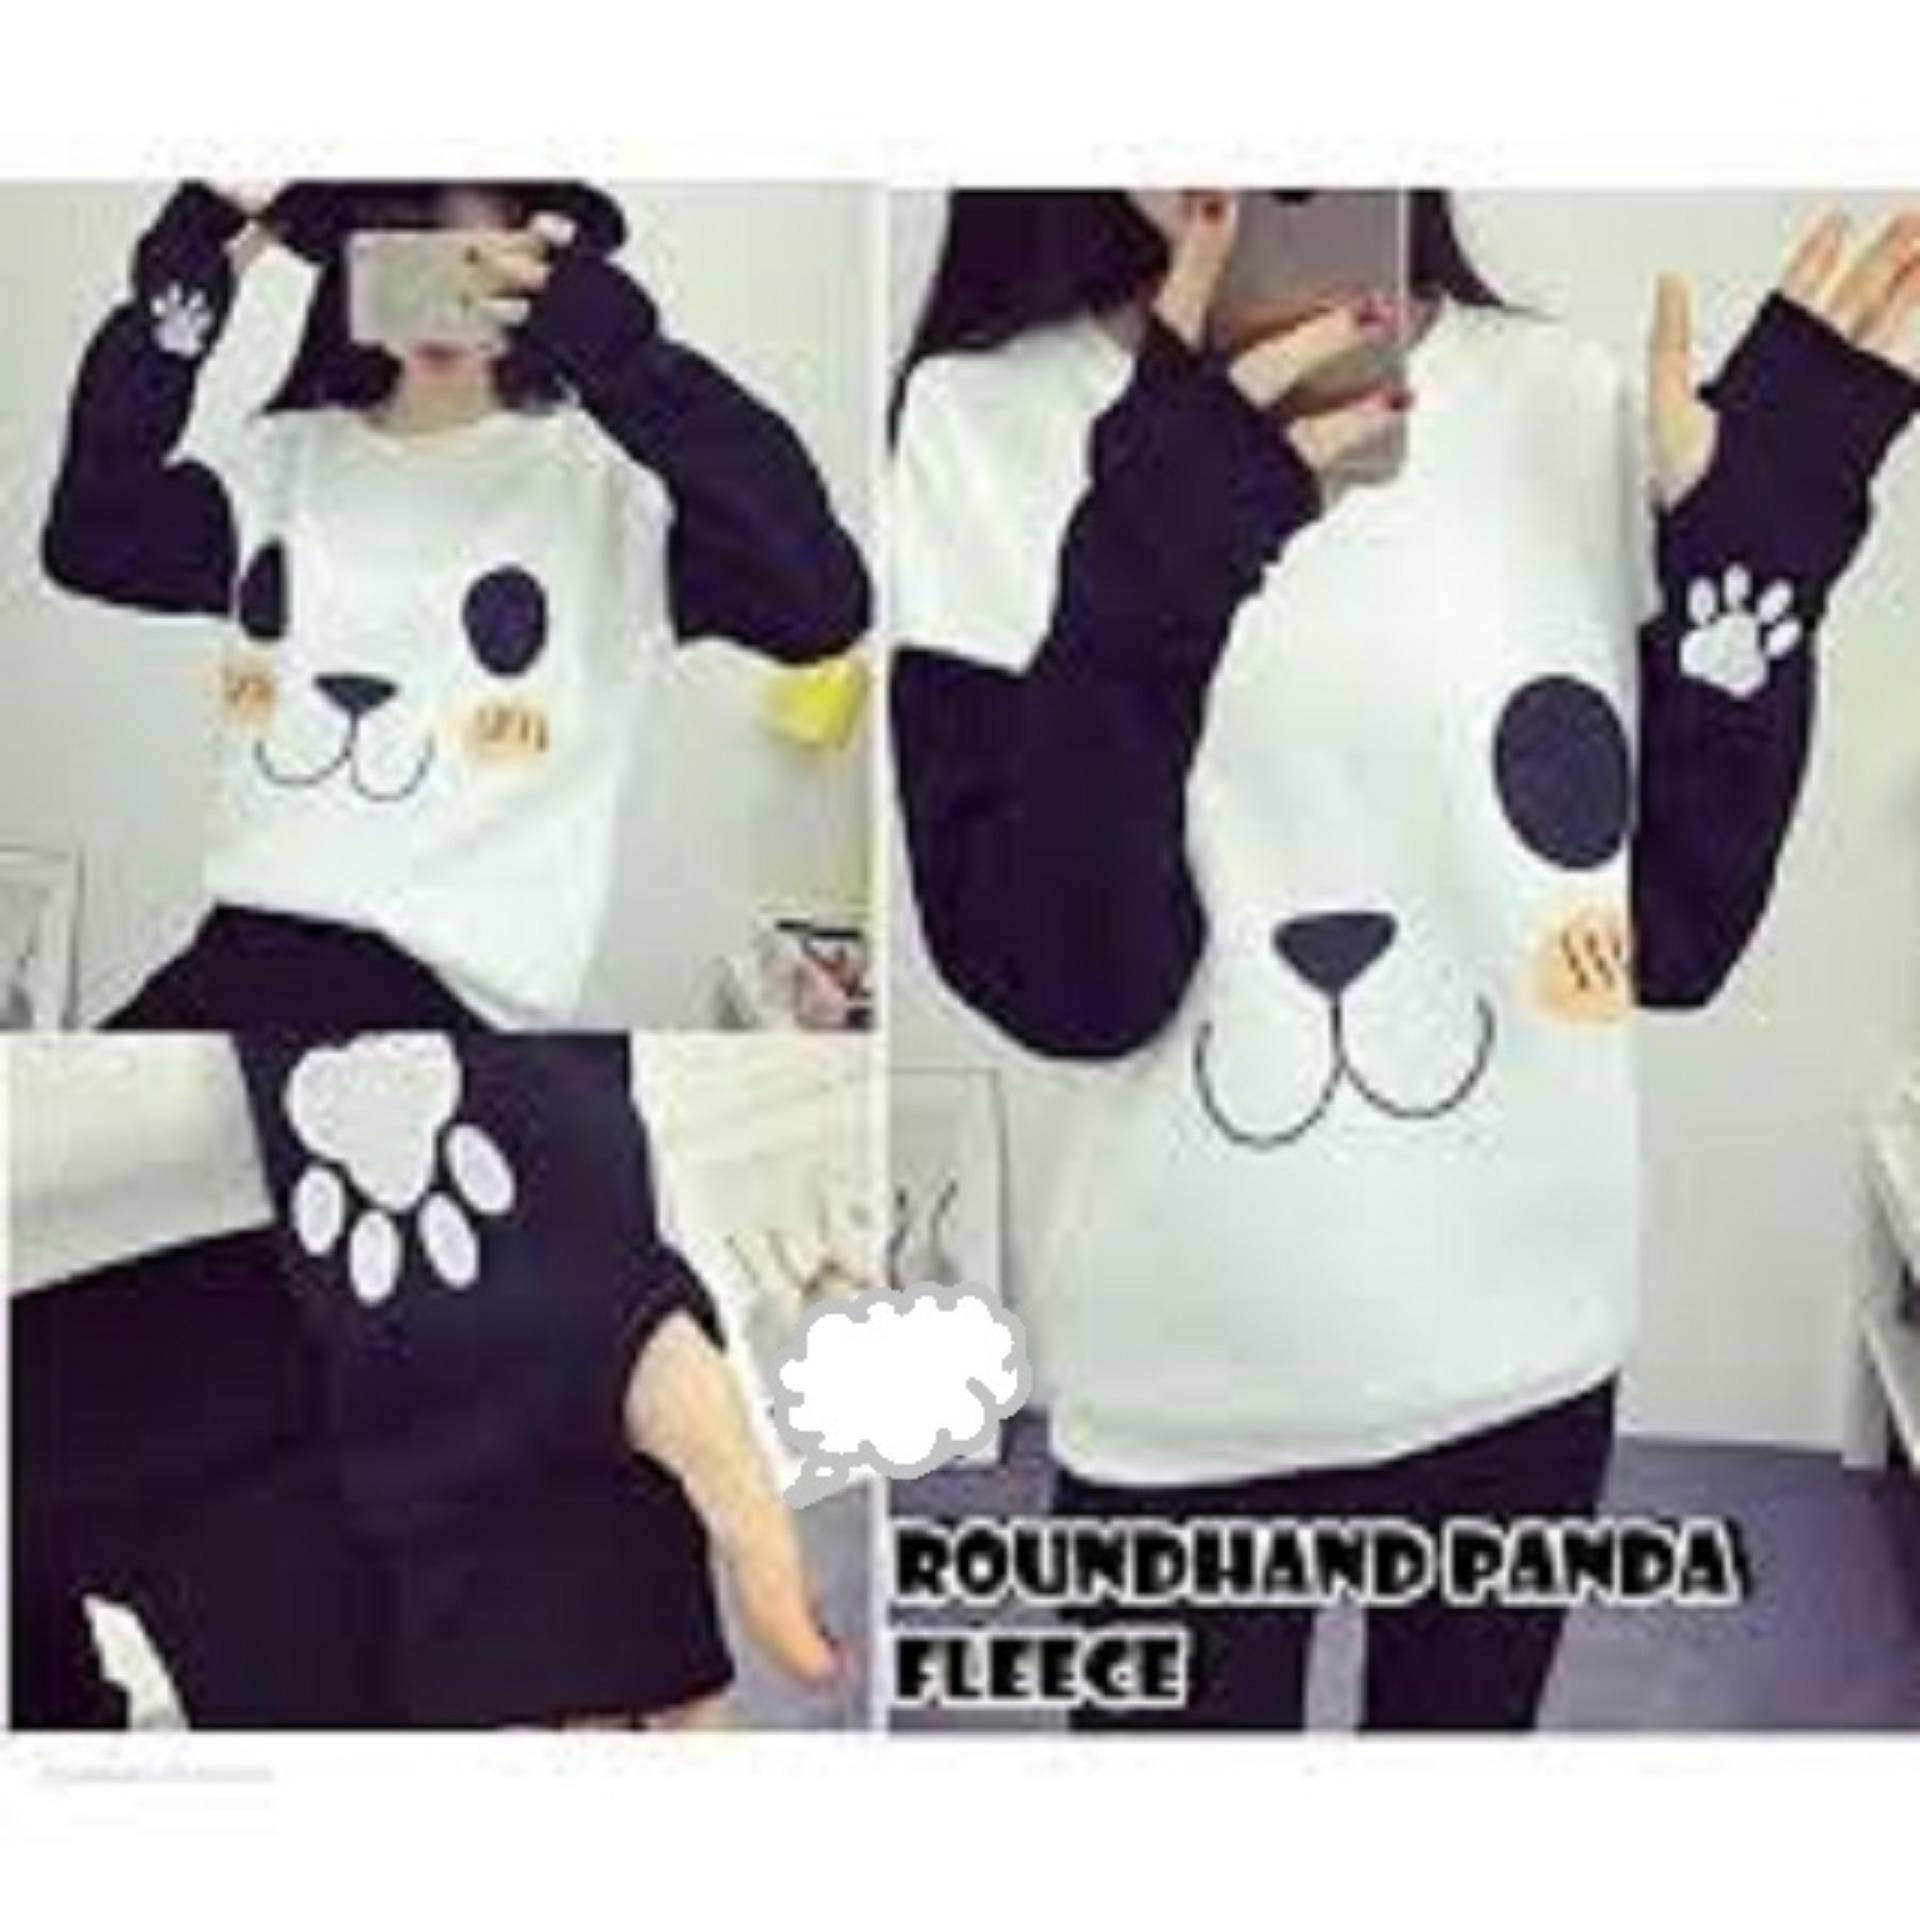 Harga Sweater Wanita Roundhand Panda Good Quality Putih Origin